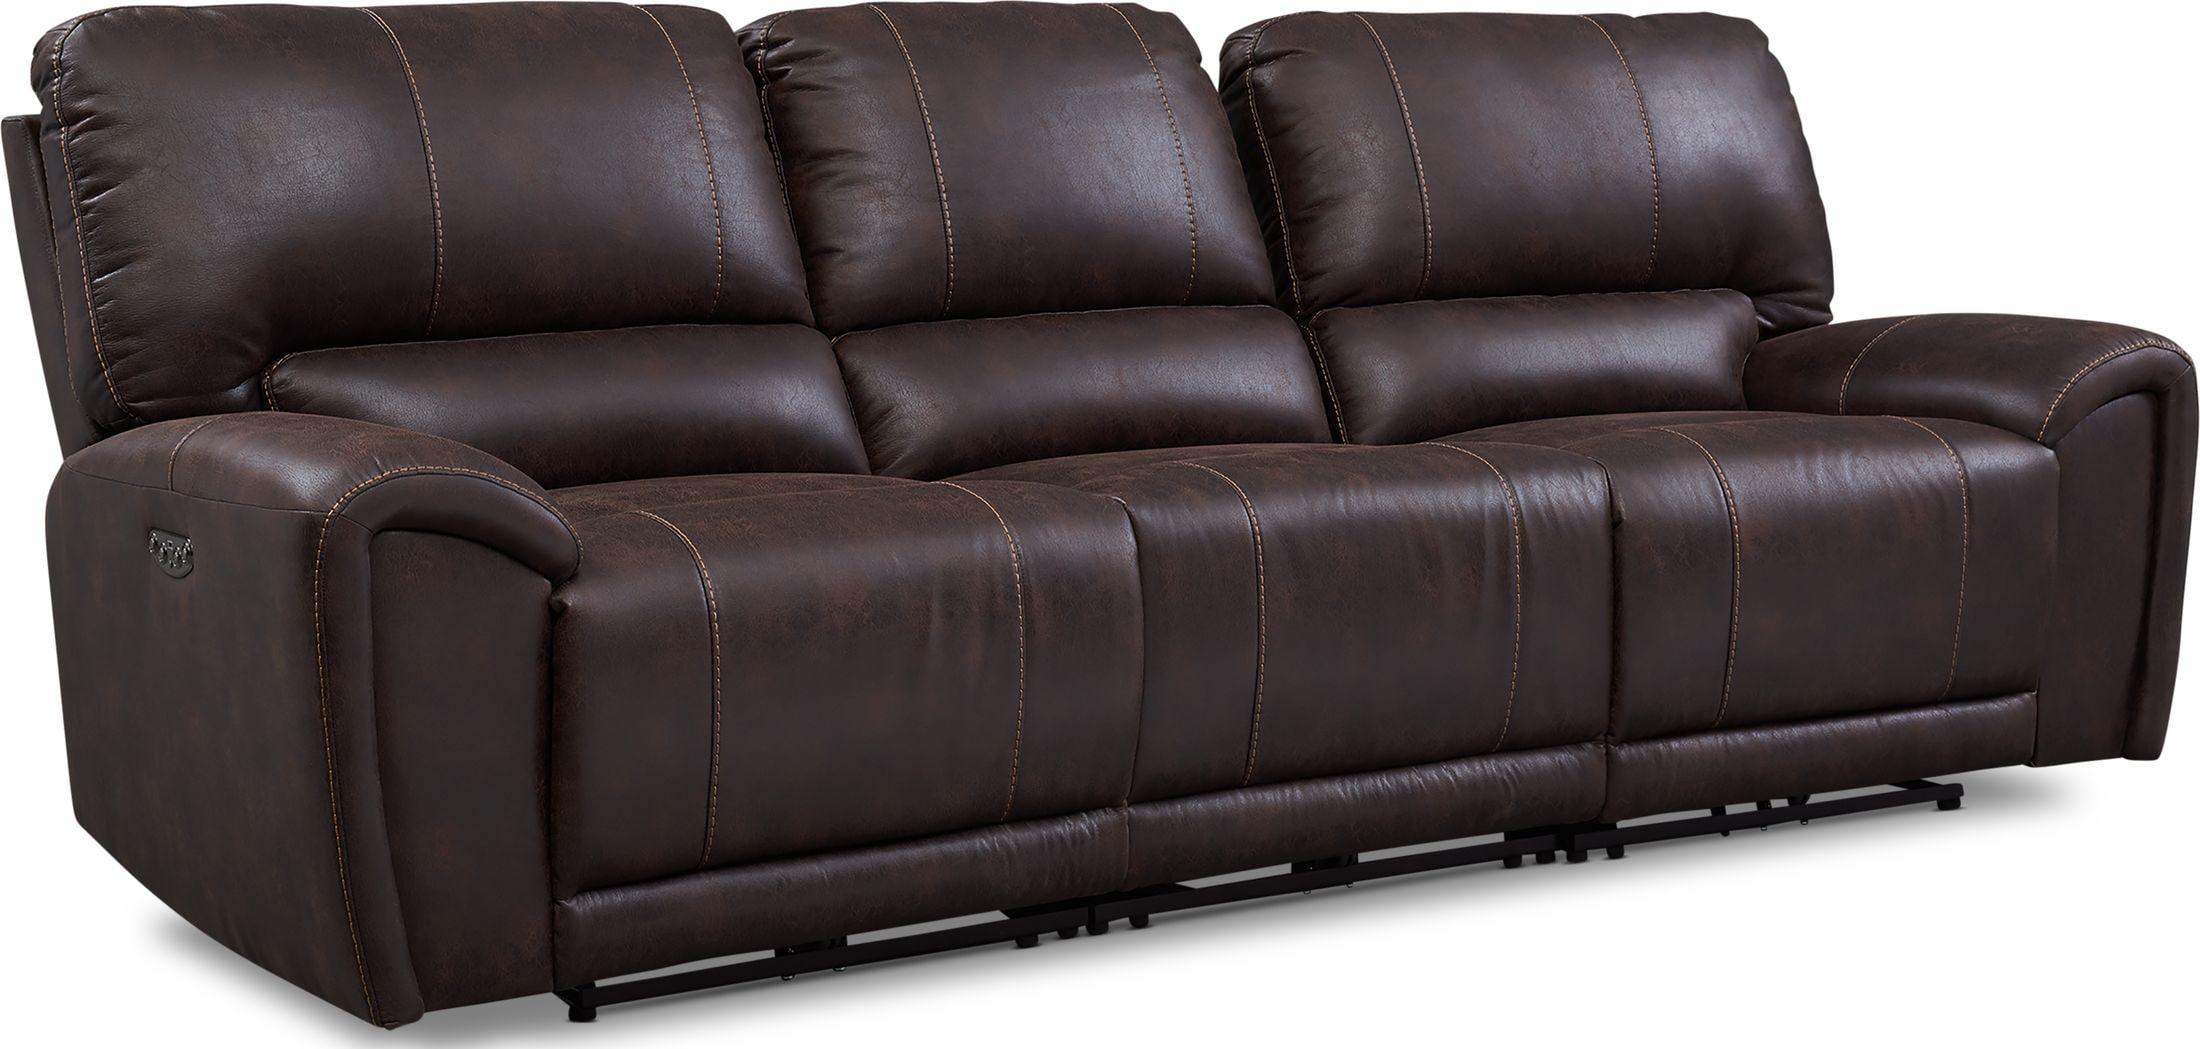 Living Room Furniture - Gallant 3-Piece Dual-Power Reclining Sofa